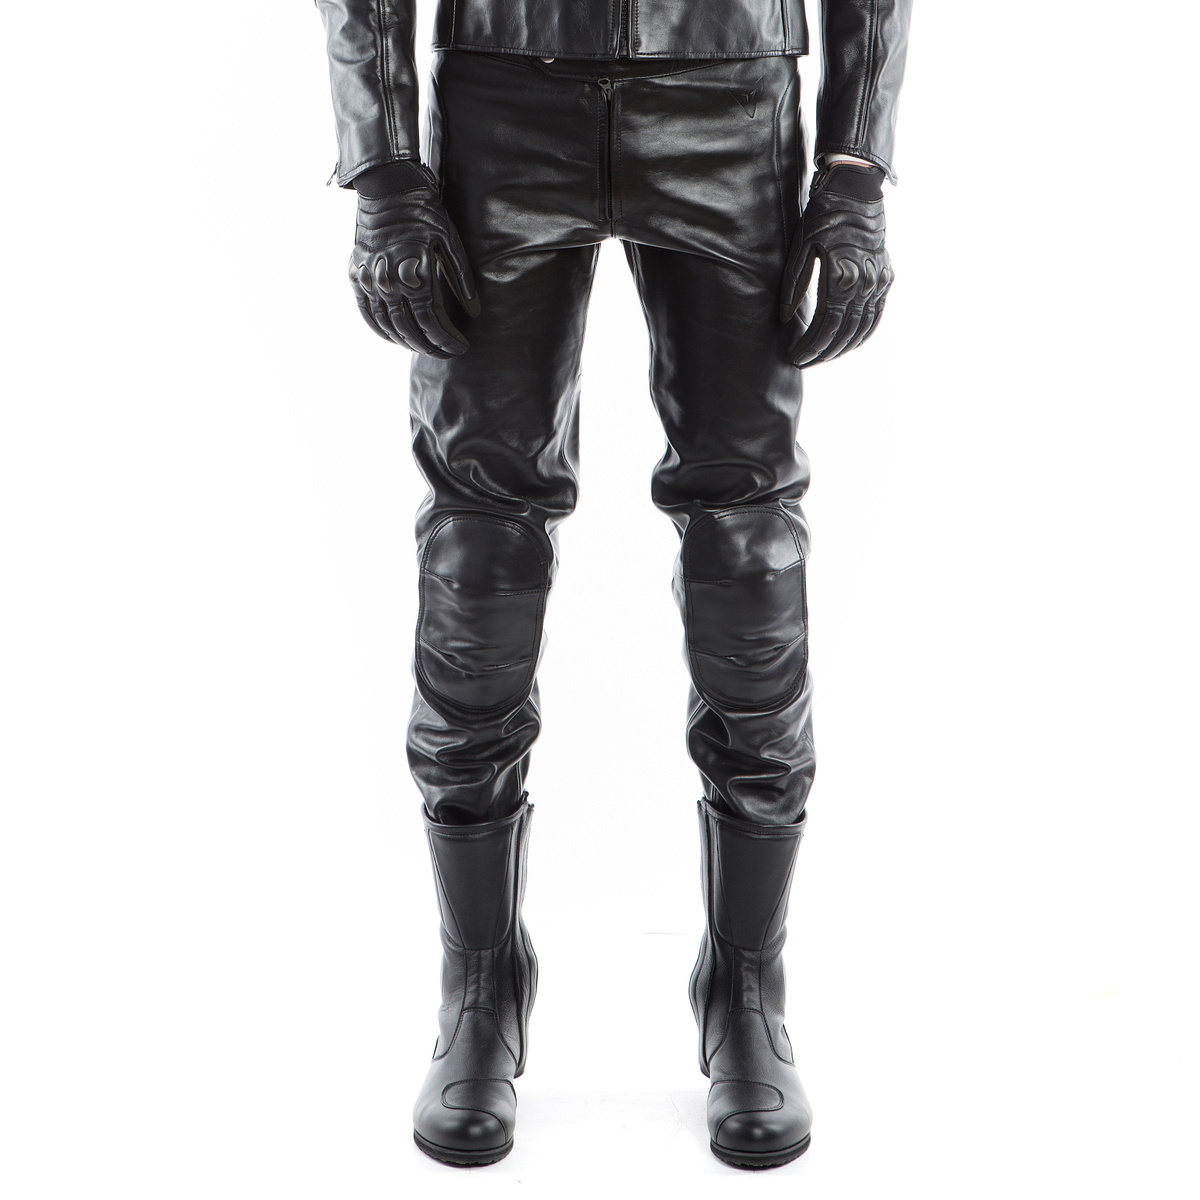 Piega Homme Noir Moto Cuir 72 Dainese Pantalon FK3lT1Jc